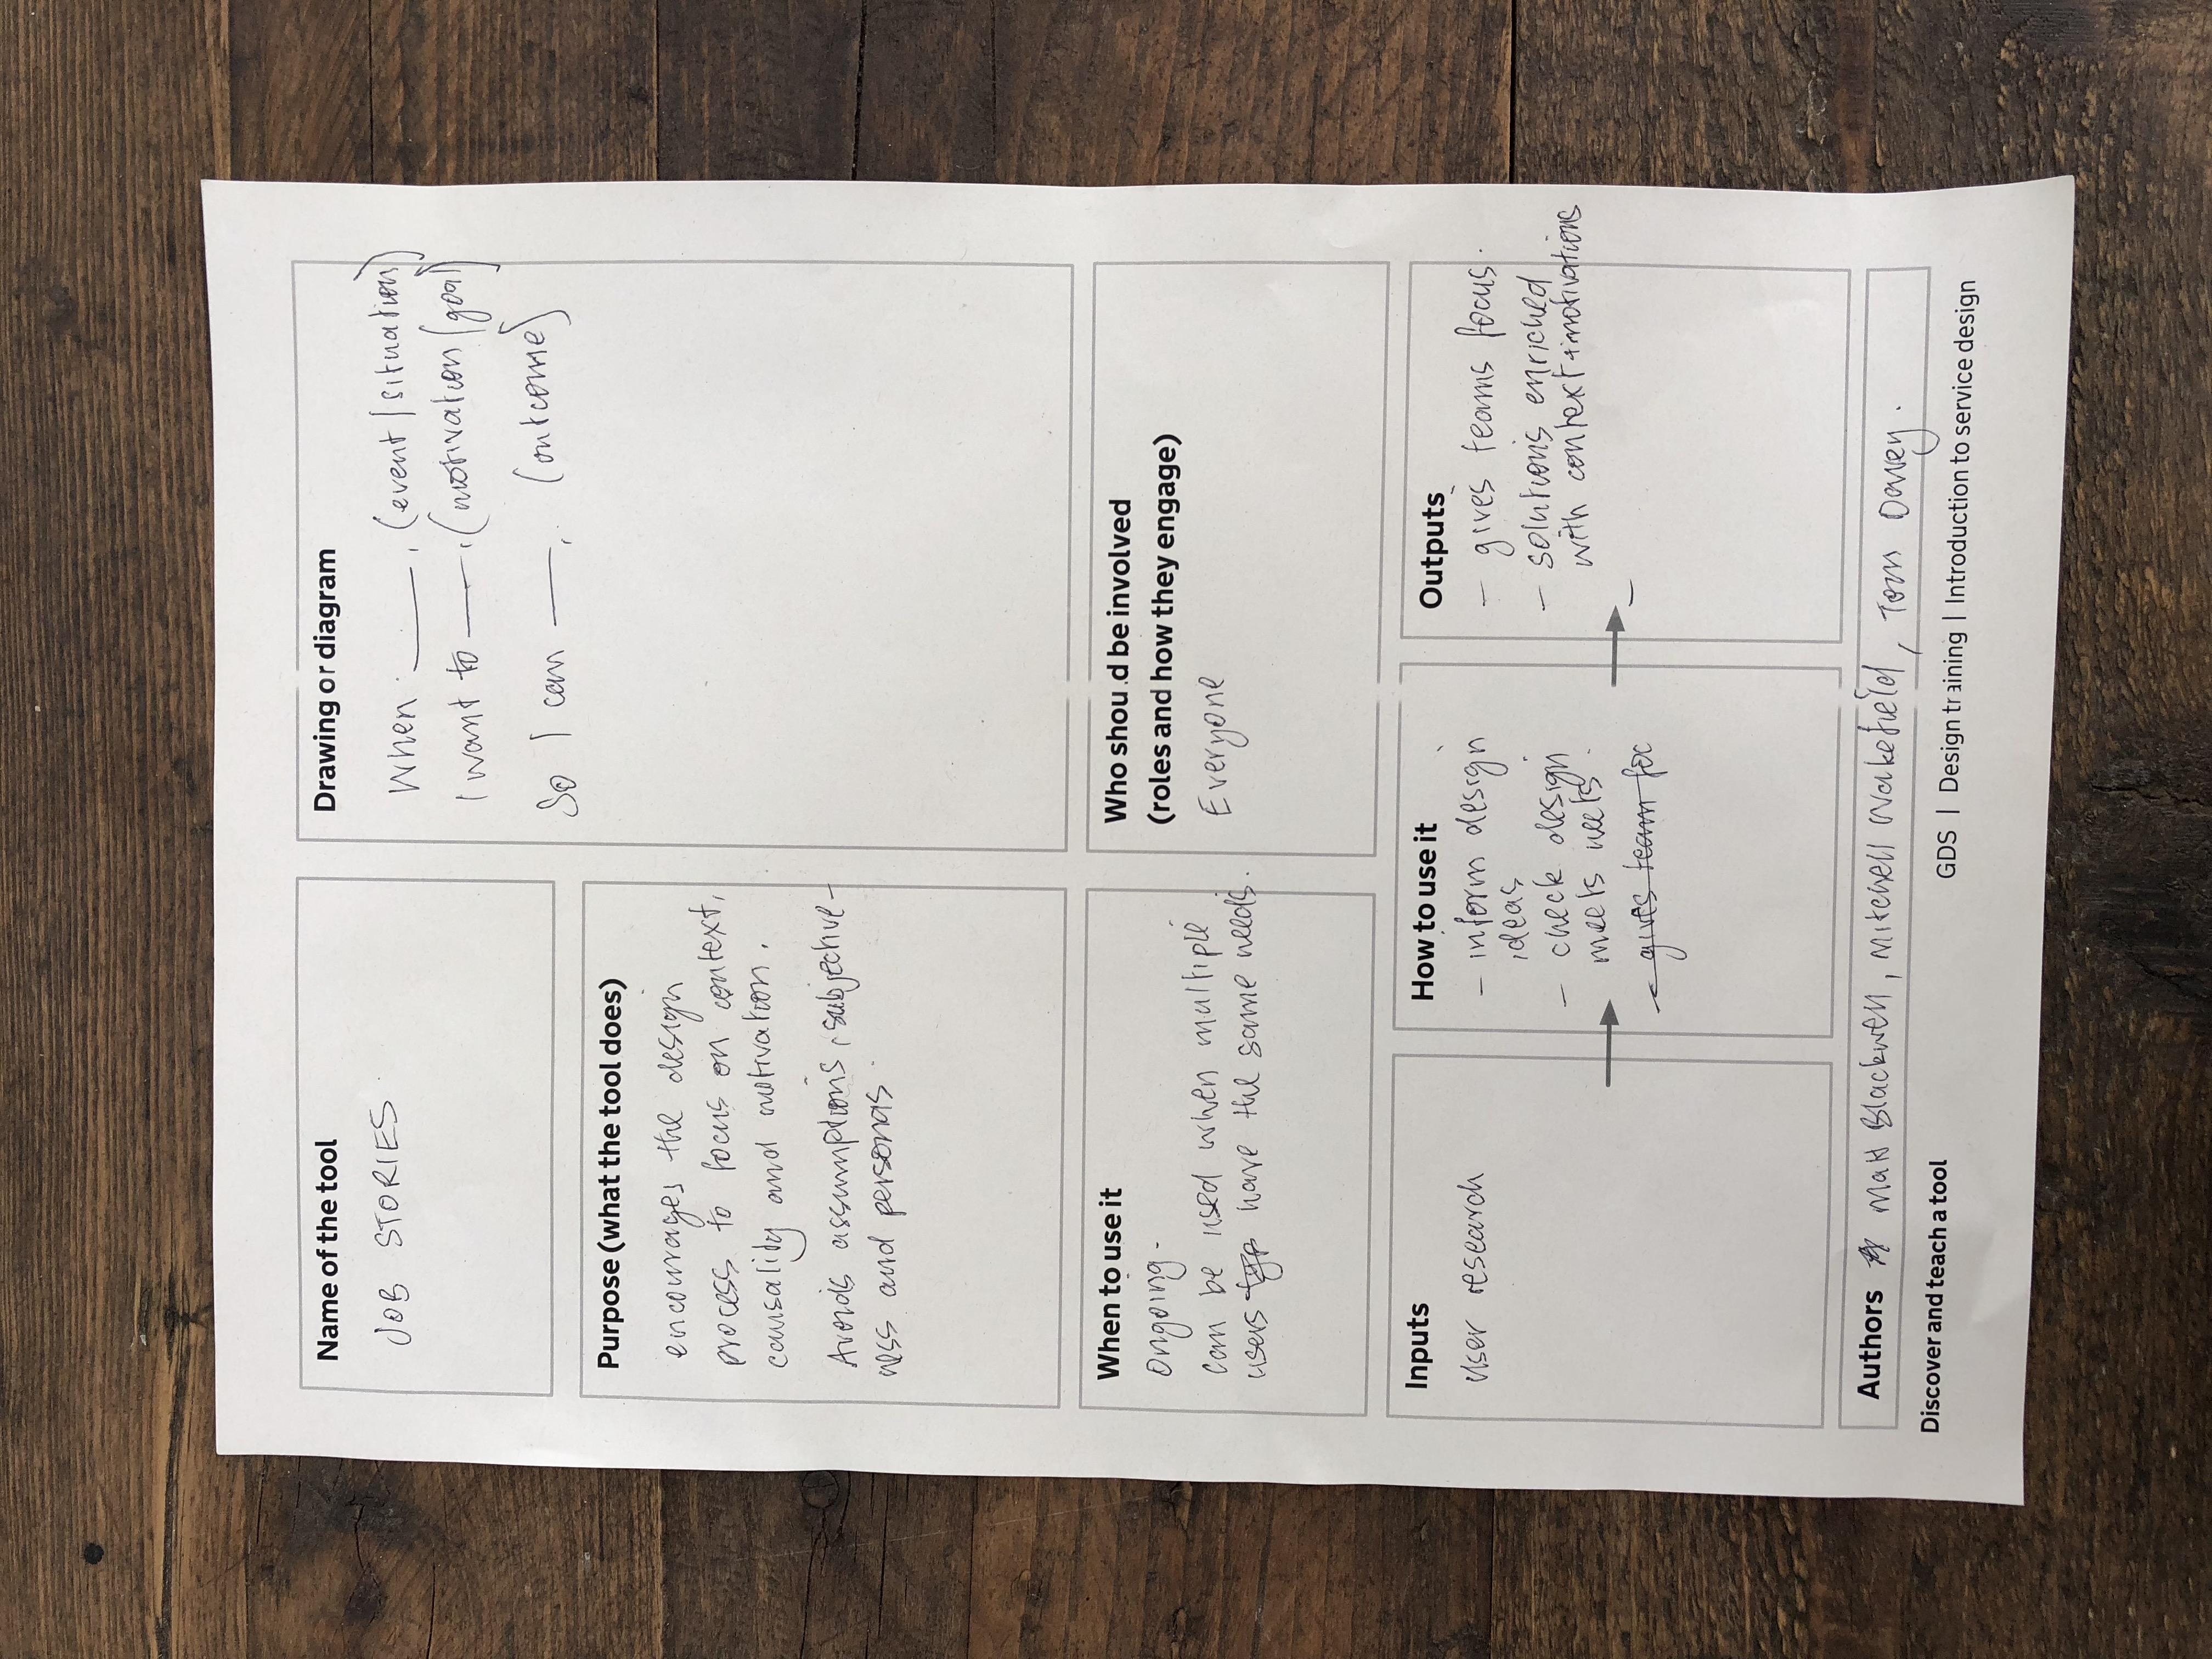 Leeds gov design meet number 2 done simon wilson canvas 1 job stories malvernweather Images